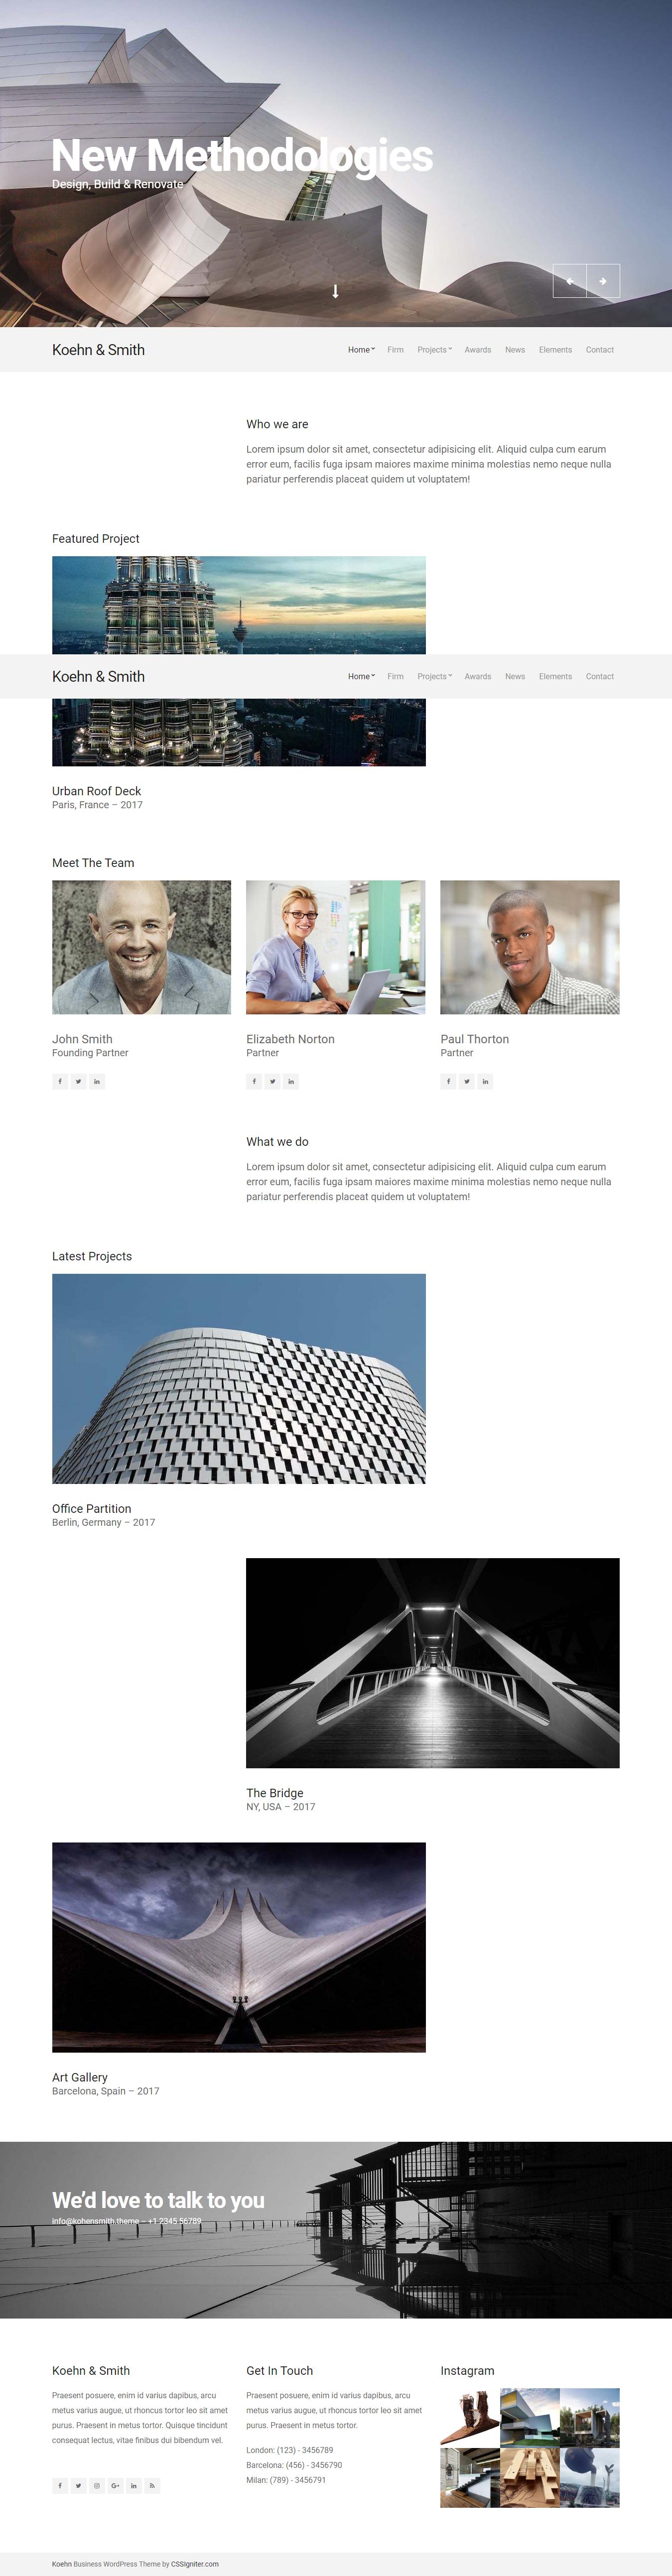 Koehn - Premium Agency WordPress Themes and Templates